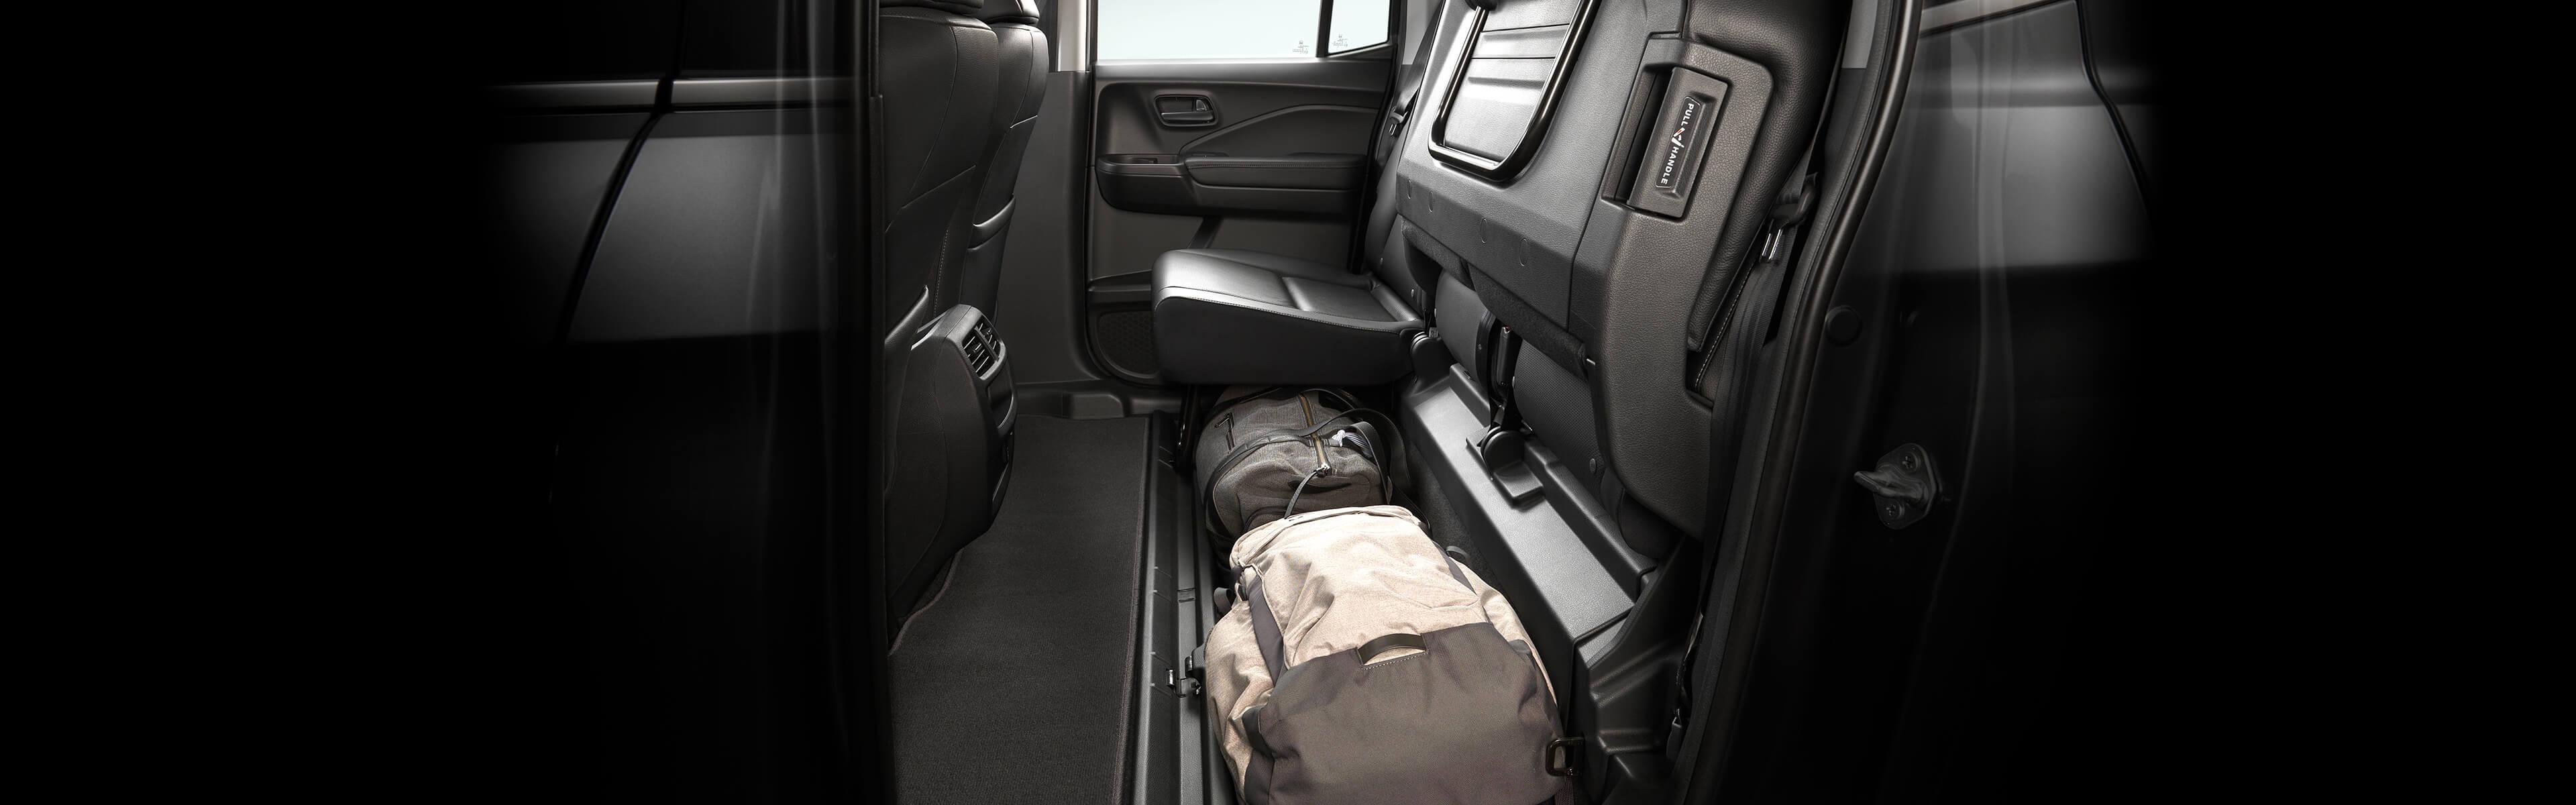 Image of 2018 Ridgeline 60/40 lift-up rear seat